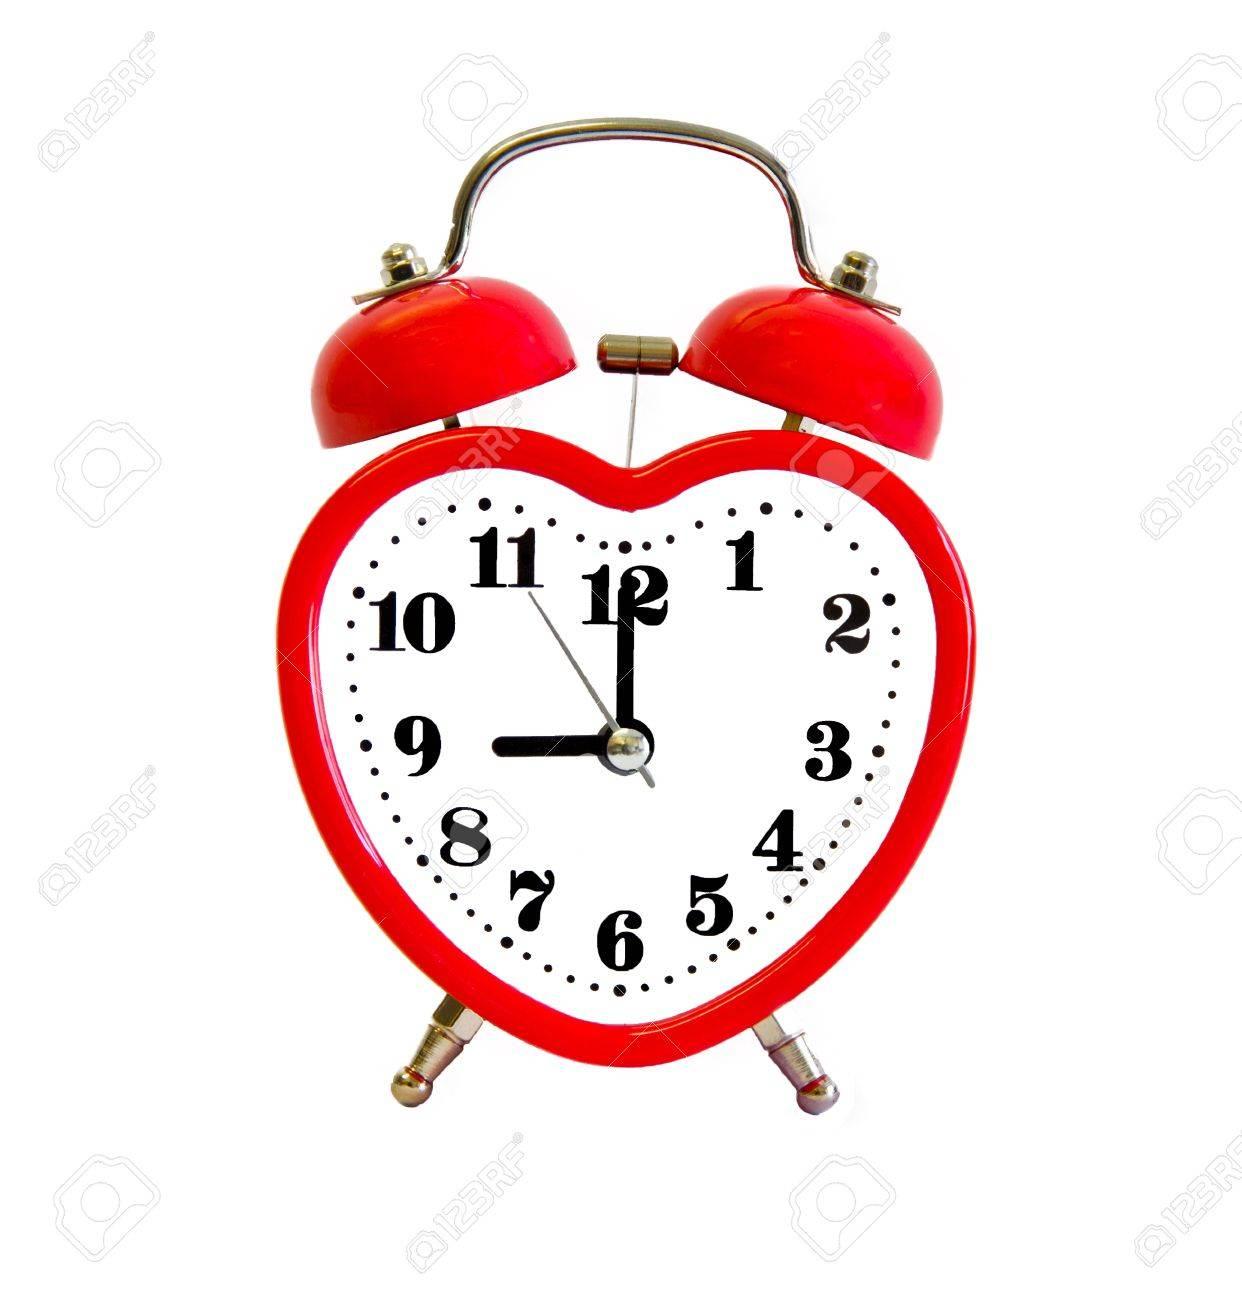 alarm clock with heart